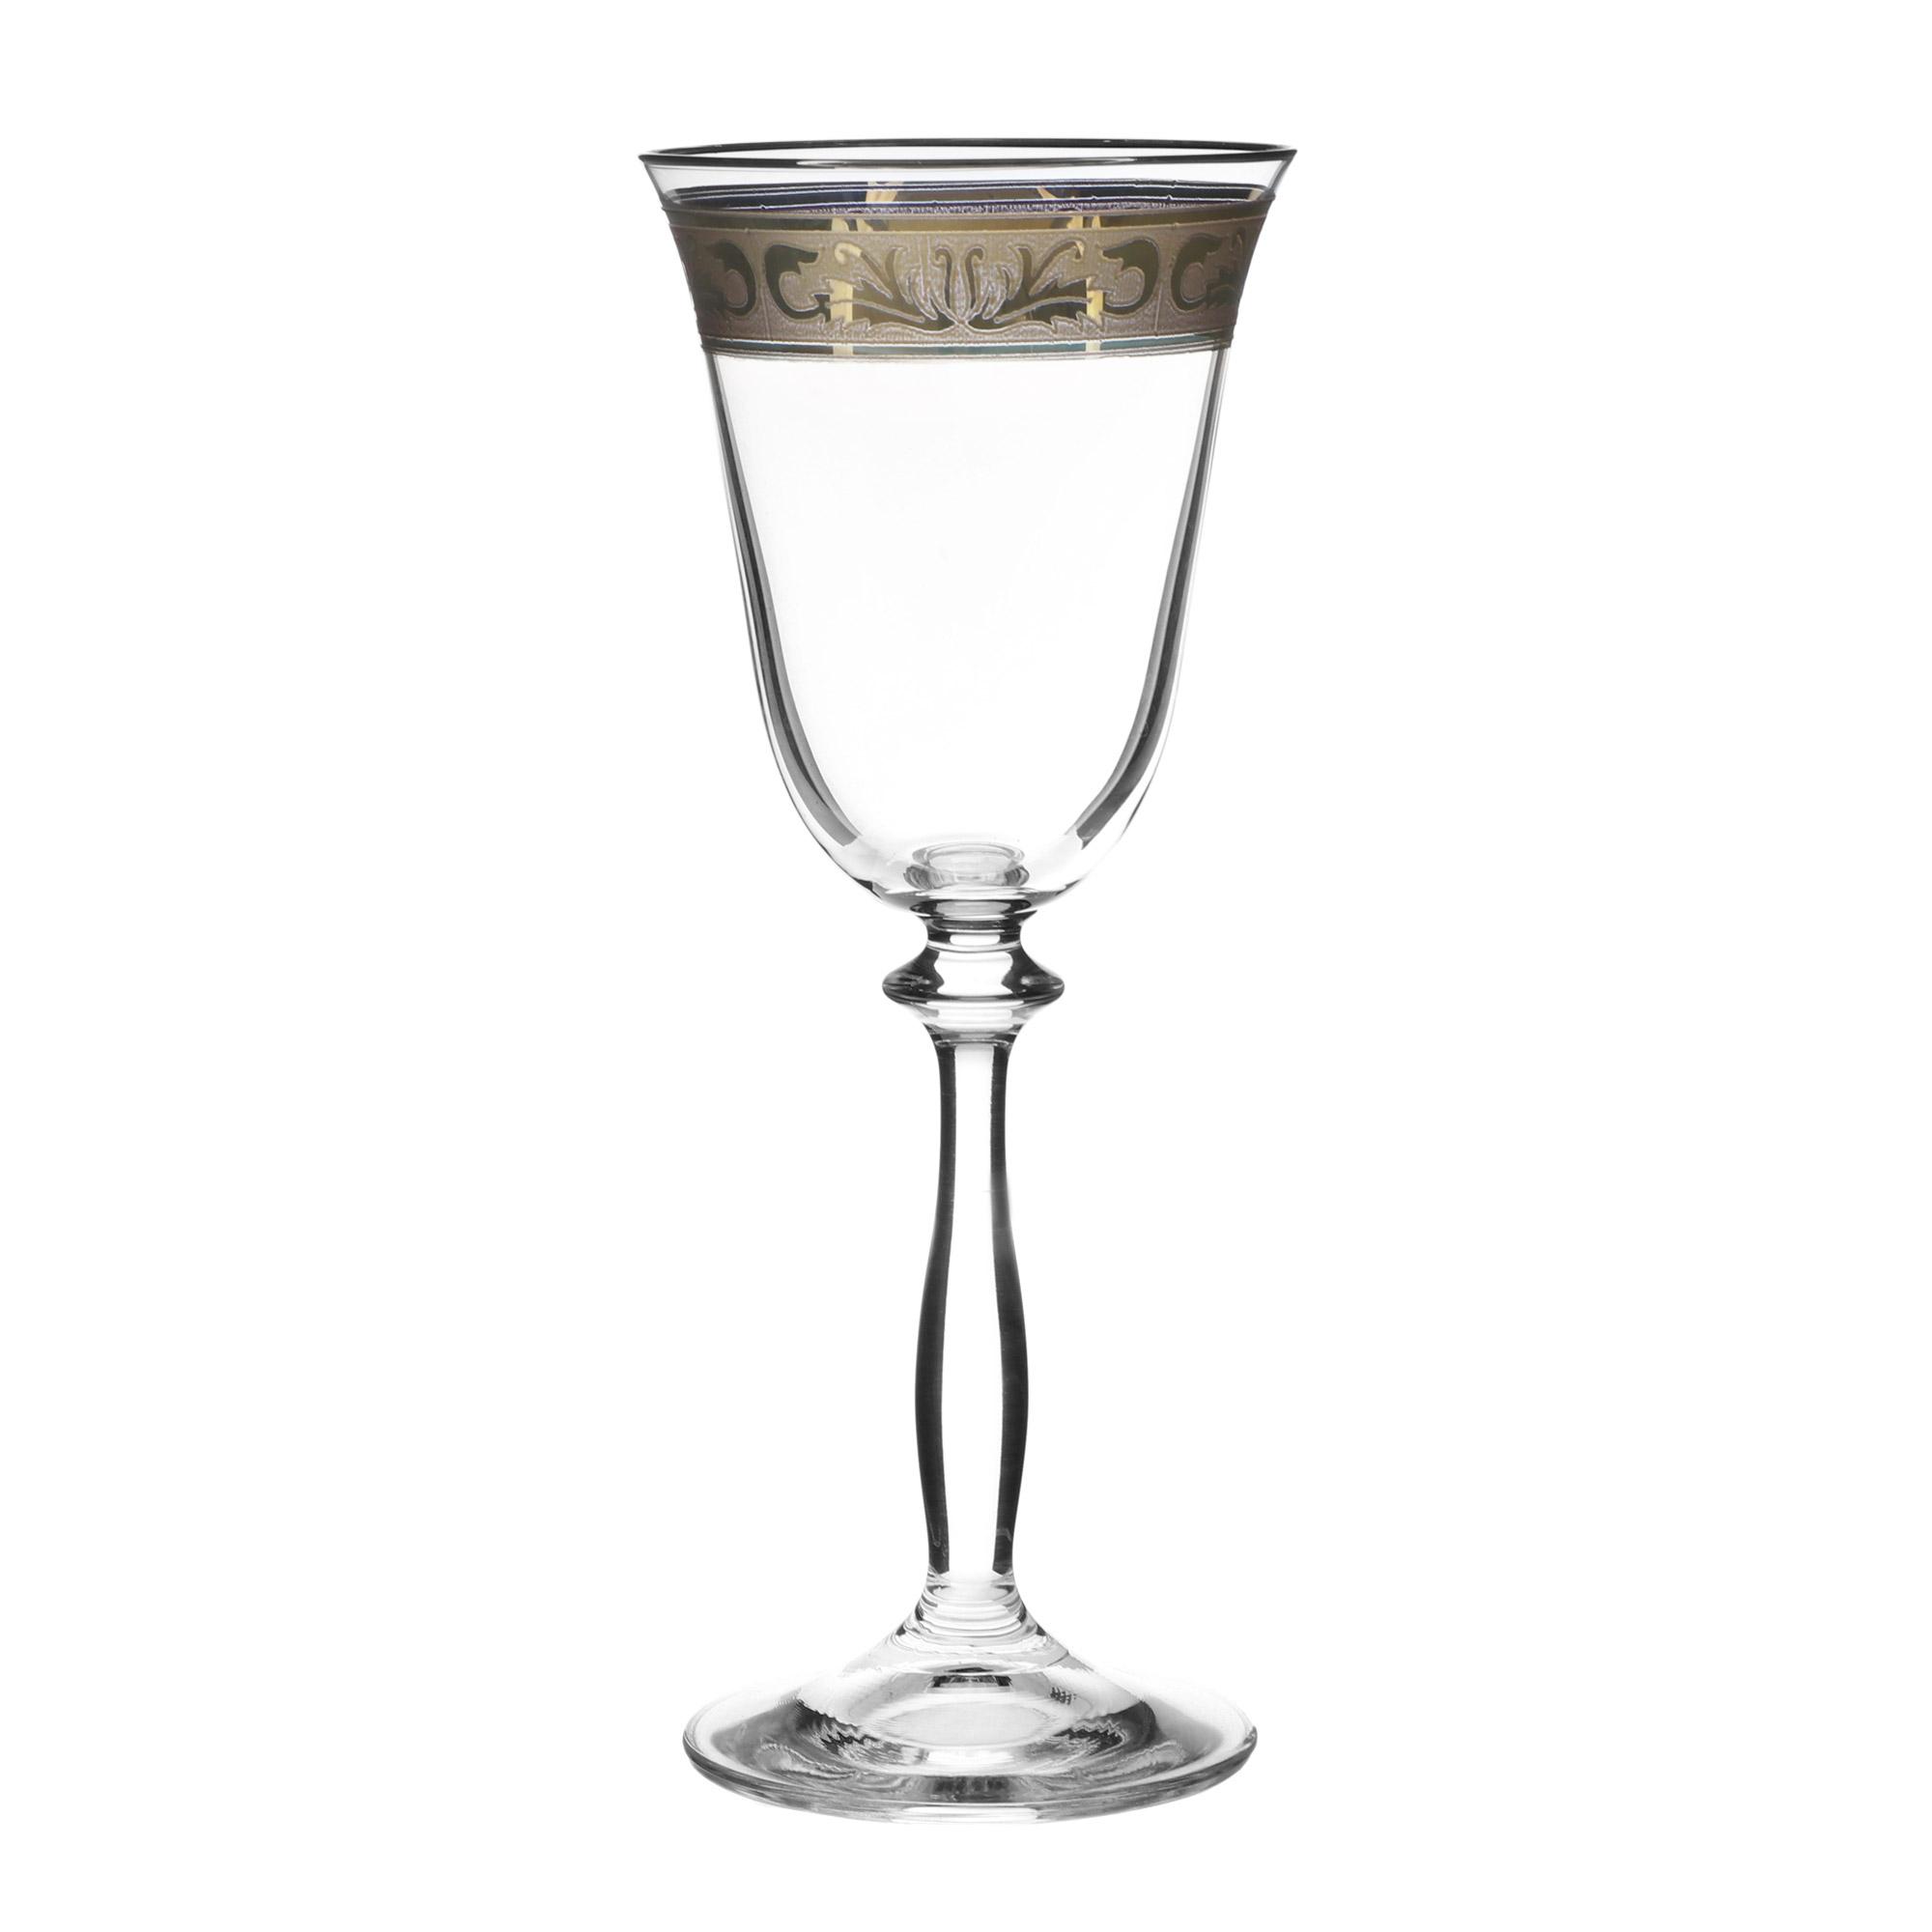 декорирование Набор рюмок для вина Crystal Bohemia ANGELA, декор Диарит, декорирование золотом, 185 мл (набор 6 шт)